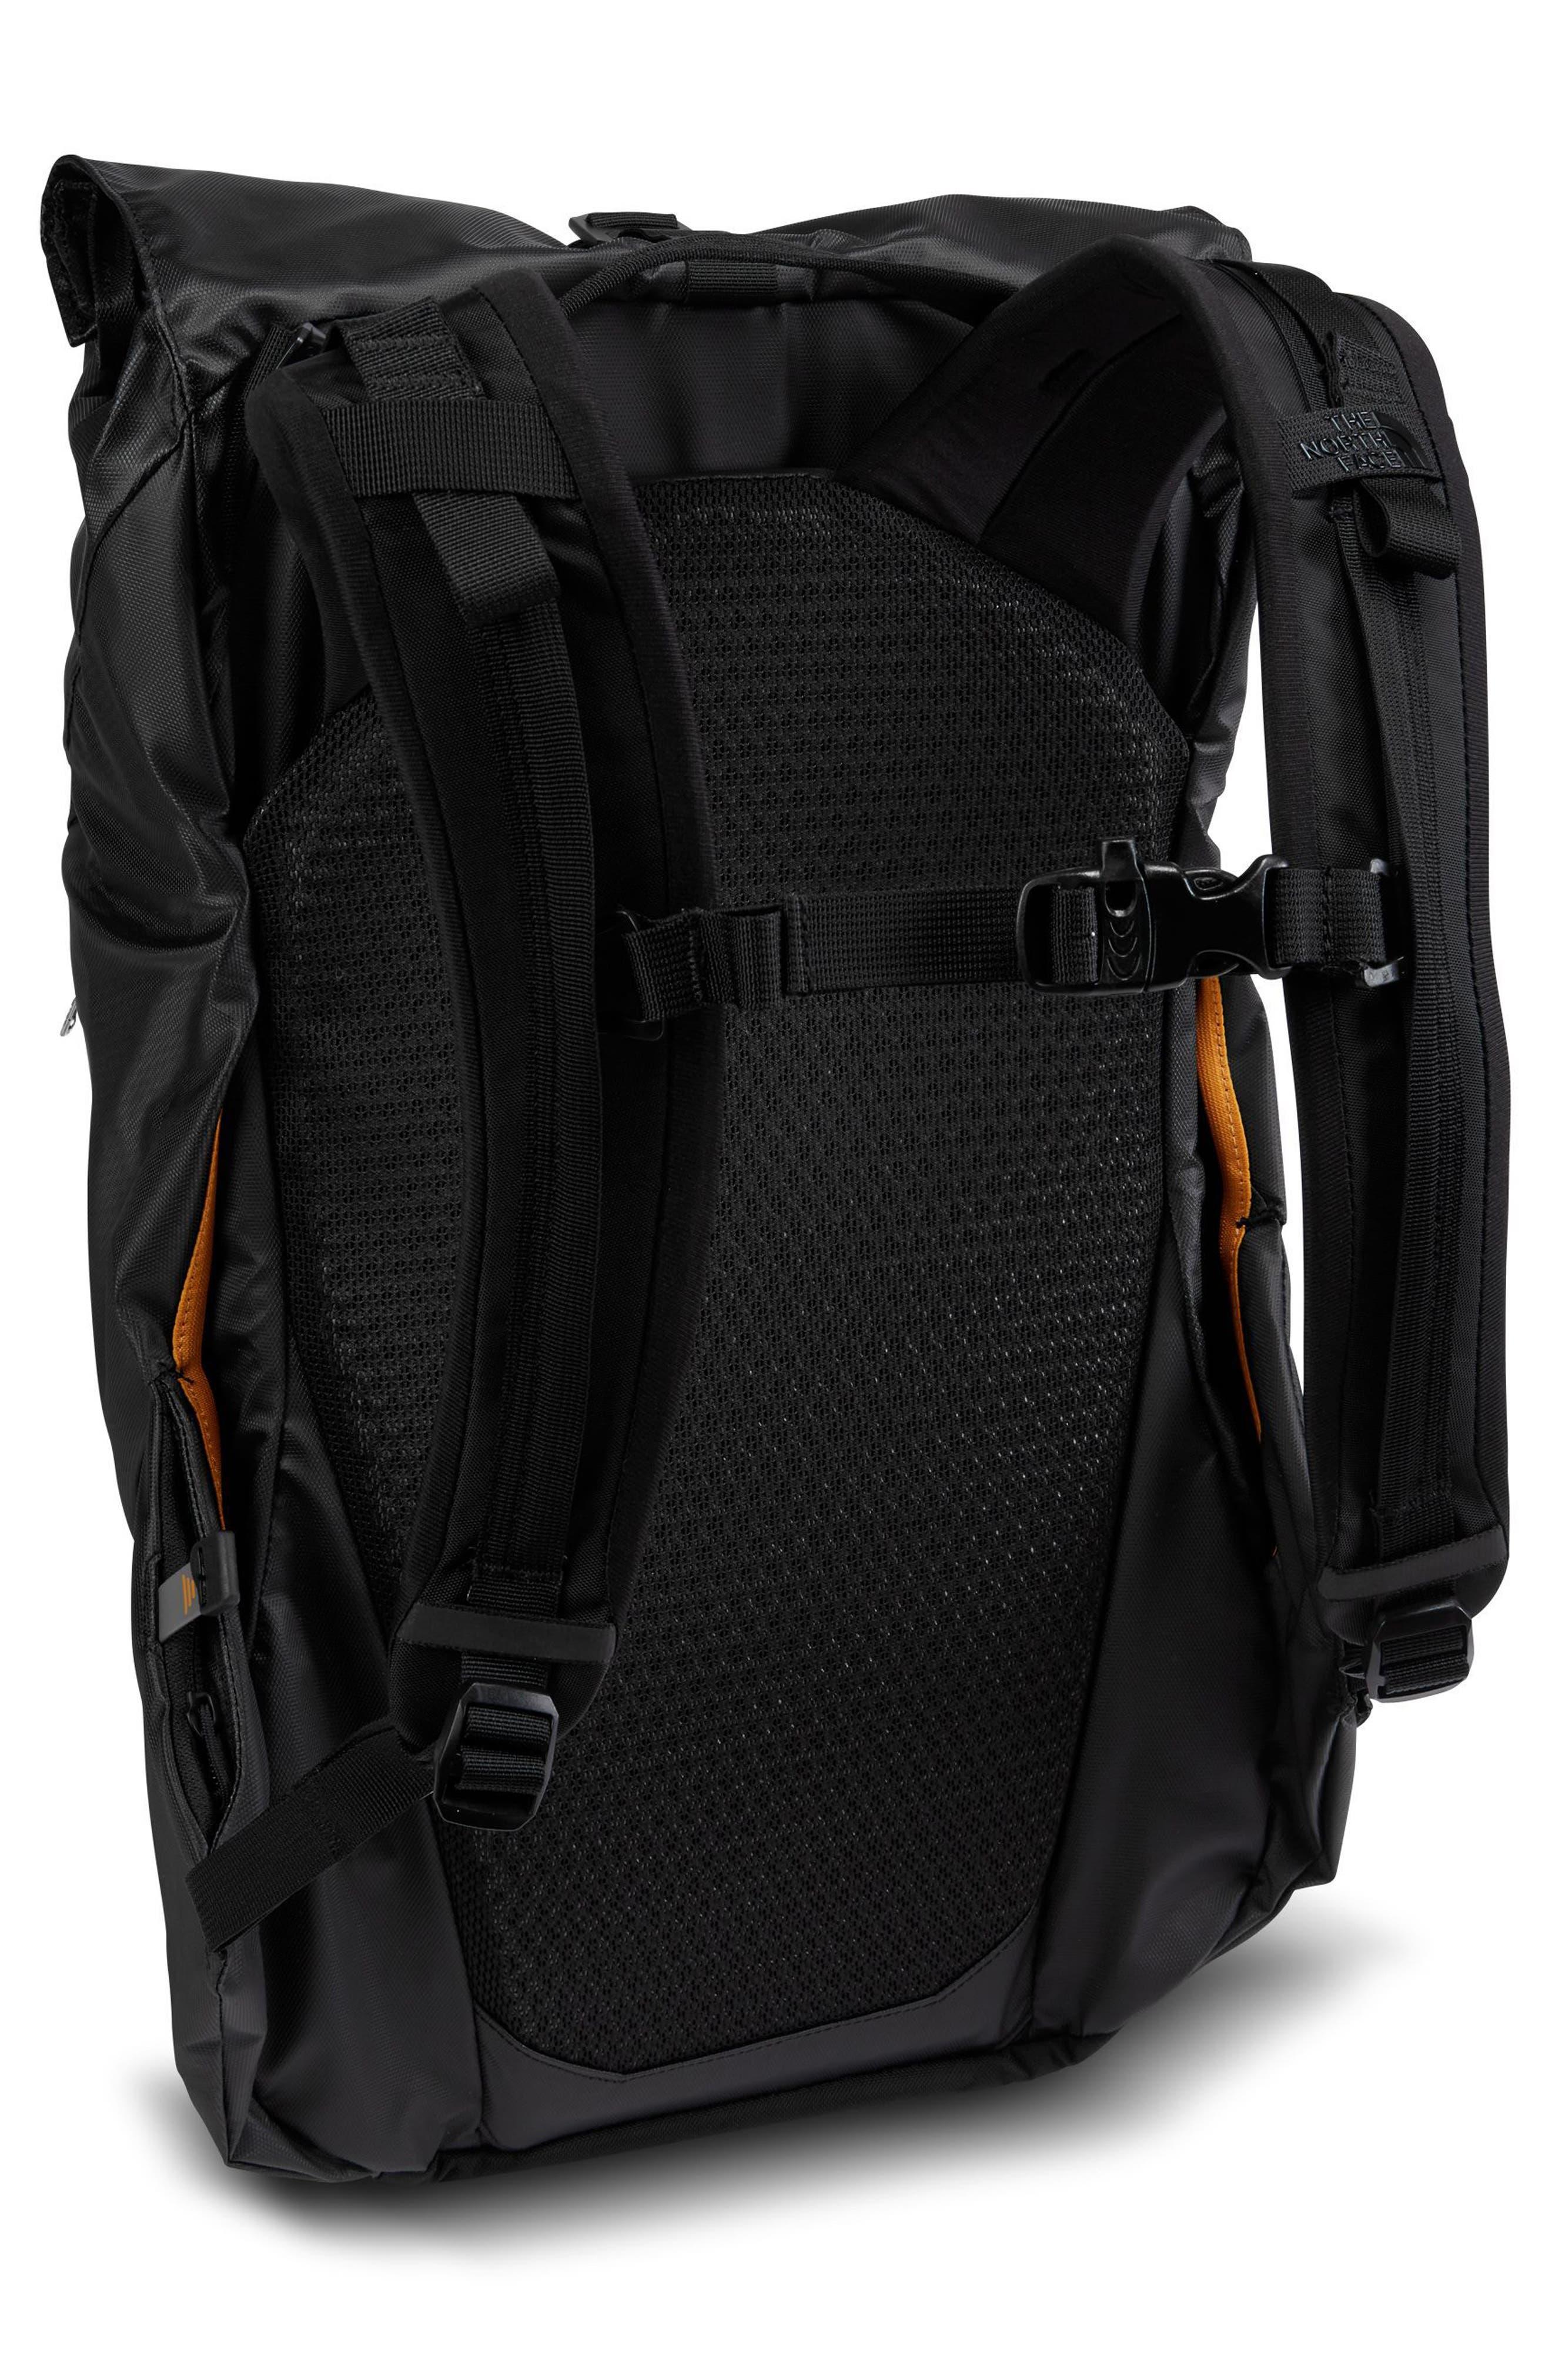 Itinerant Backpack,                             Alternate thumbnail 2, color,                             Tnf Black